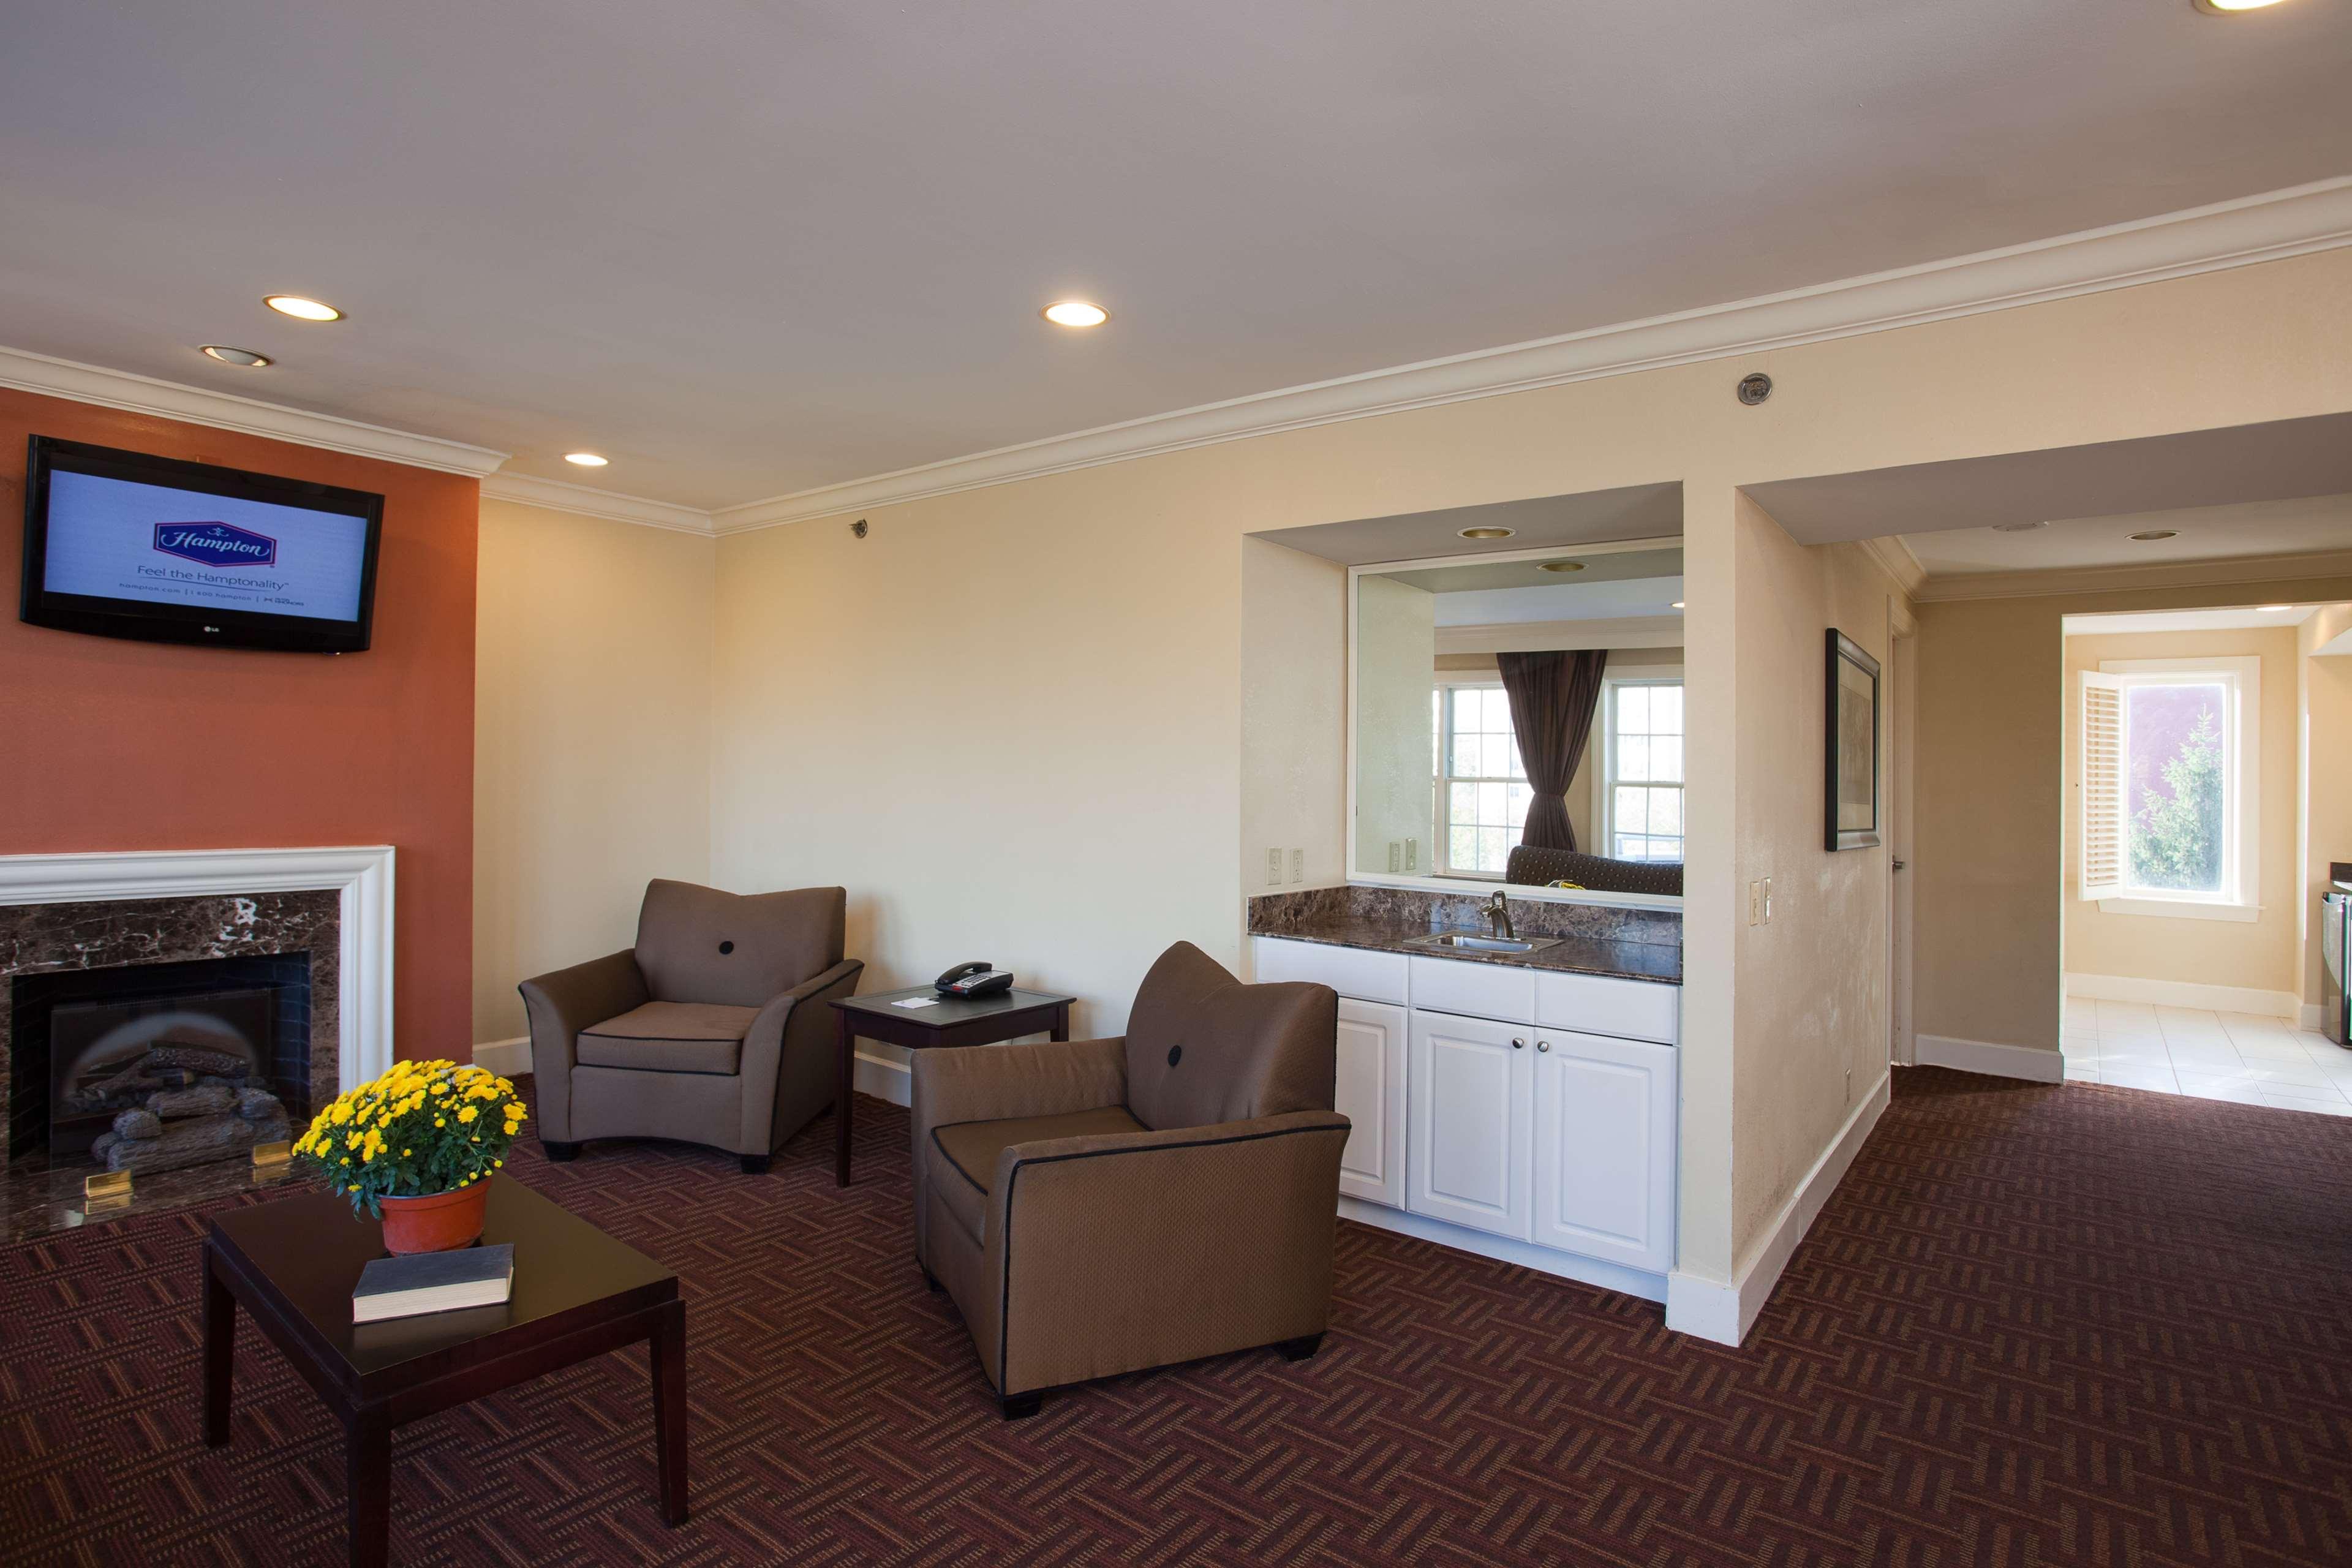 Hampton Inn & Suites Stamford image 30